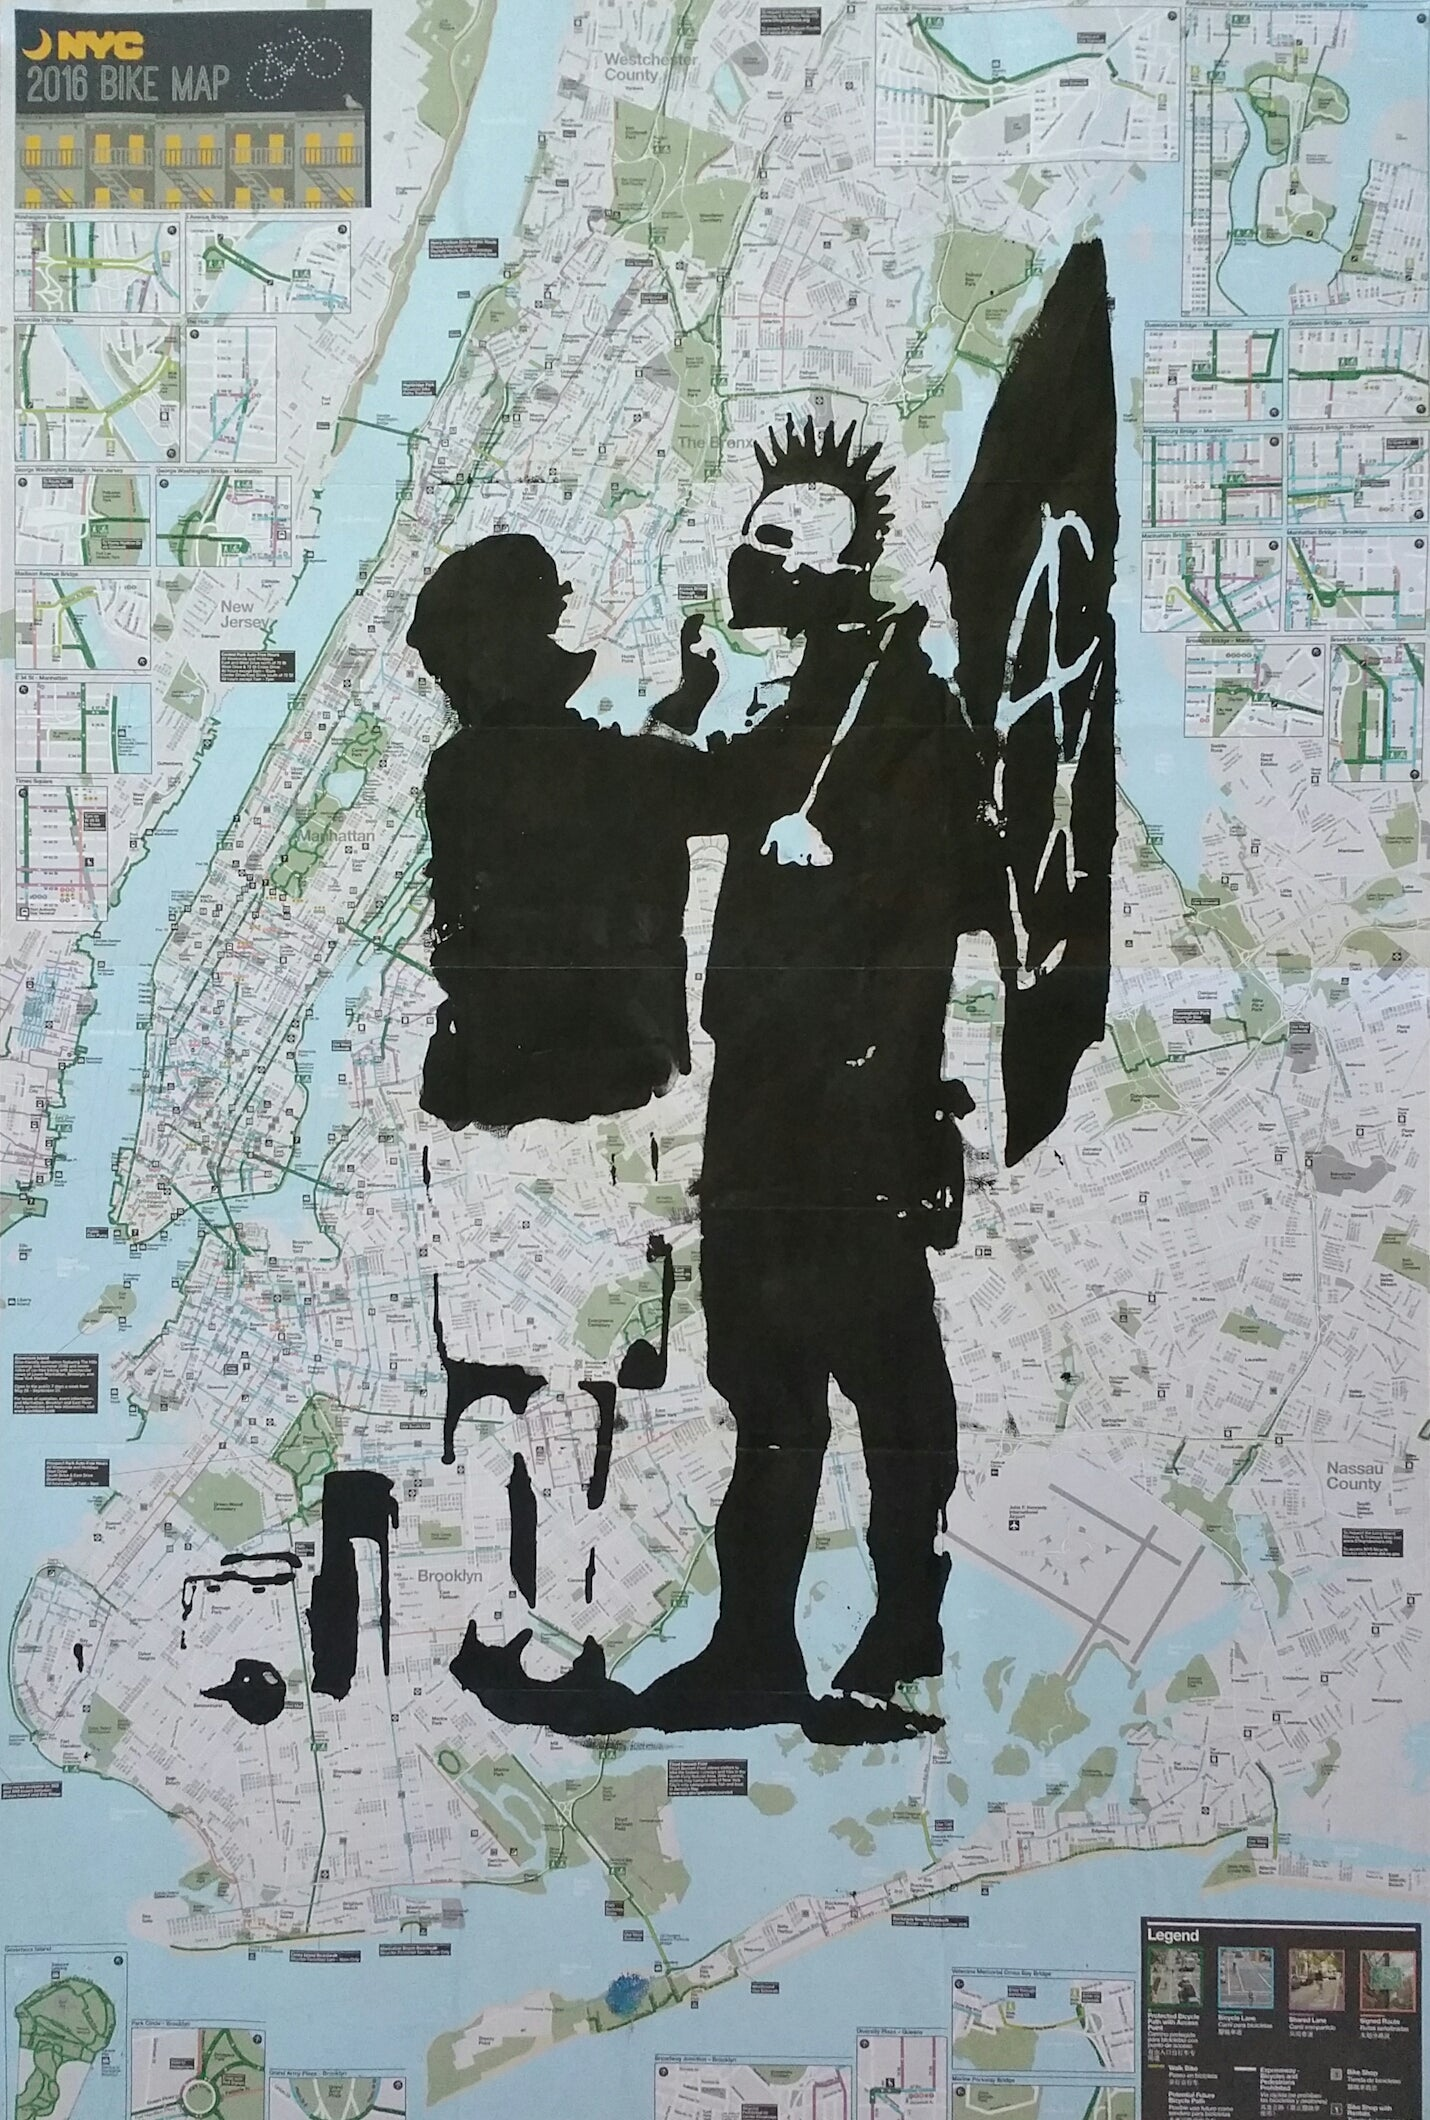 Subway Map Bike.Banksy Reproduction Original Silkscreen On A New York City Bike And Subway Map